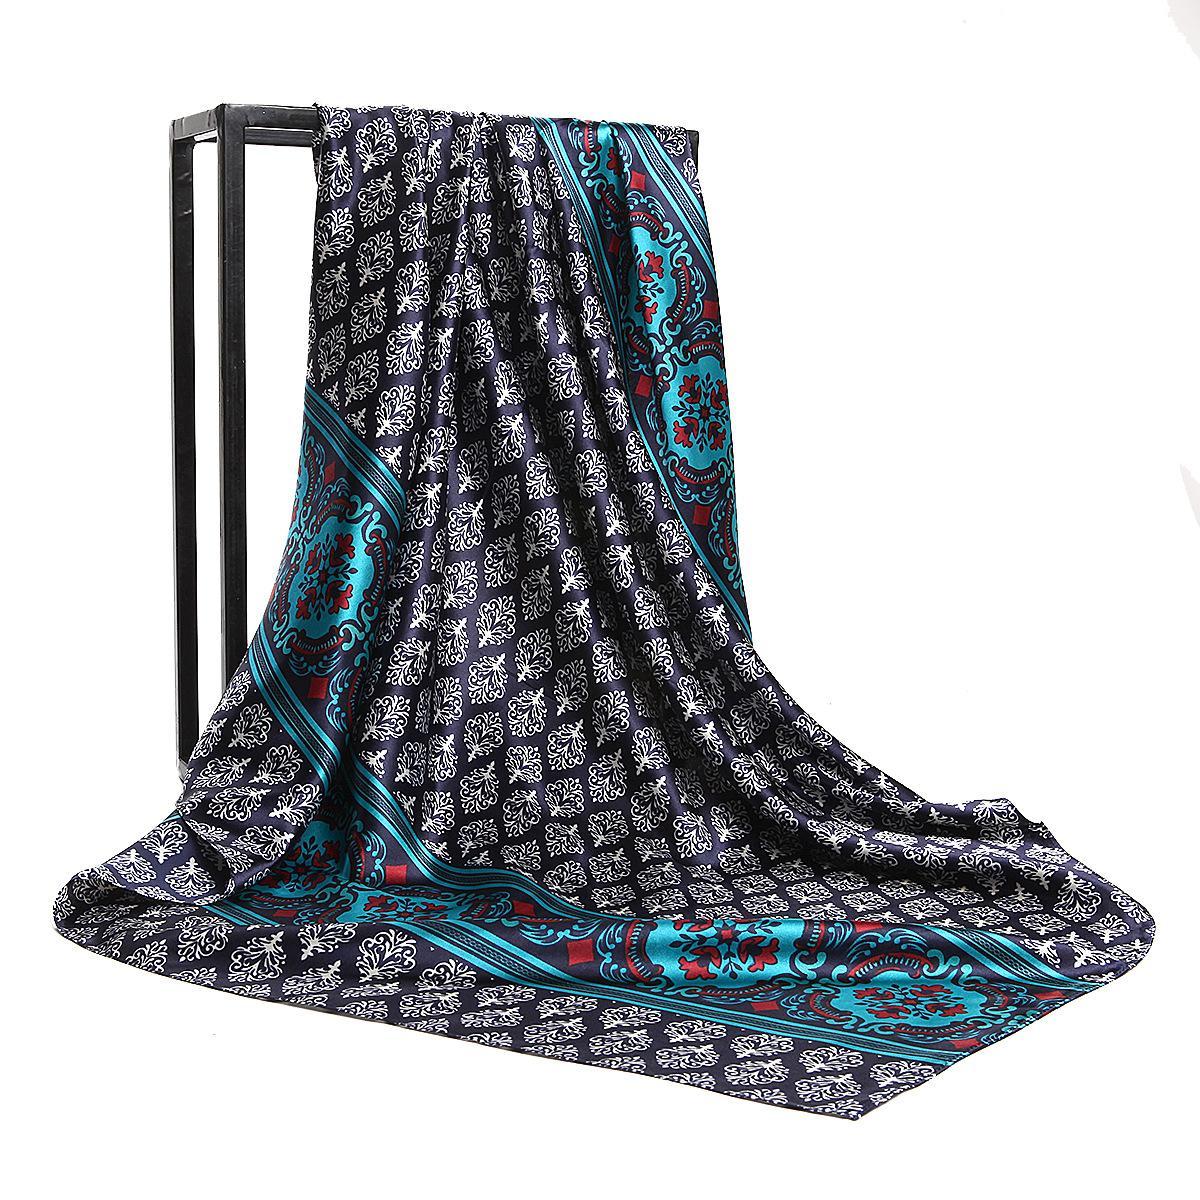 Daftar Harga Hijab Printing Terbaru Bulan Ini November 2018 New Voal Segiempat Exlusive Print Maxmara Limited Silk Scarf Traditional Chinese Ethinic Style Lady 90square 90cm90cm Stylish Floral Satin Shawl Pashima Bandana